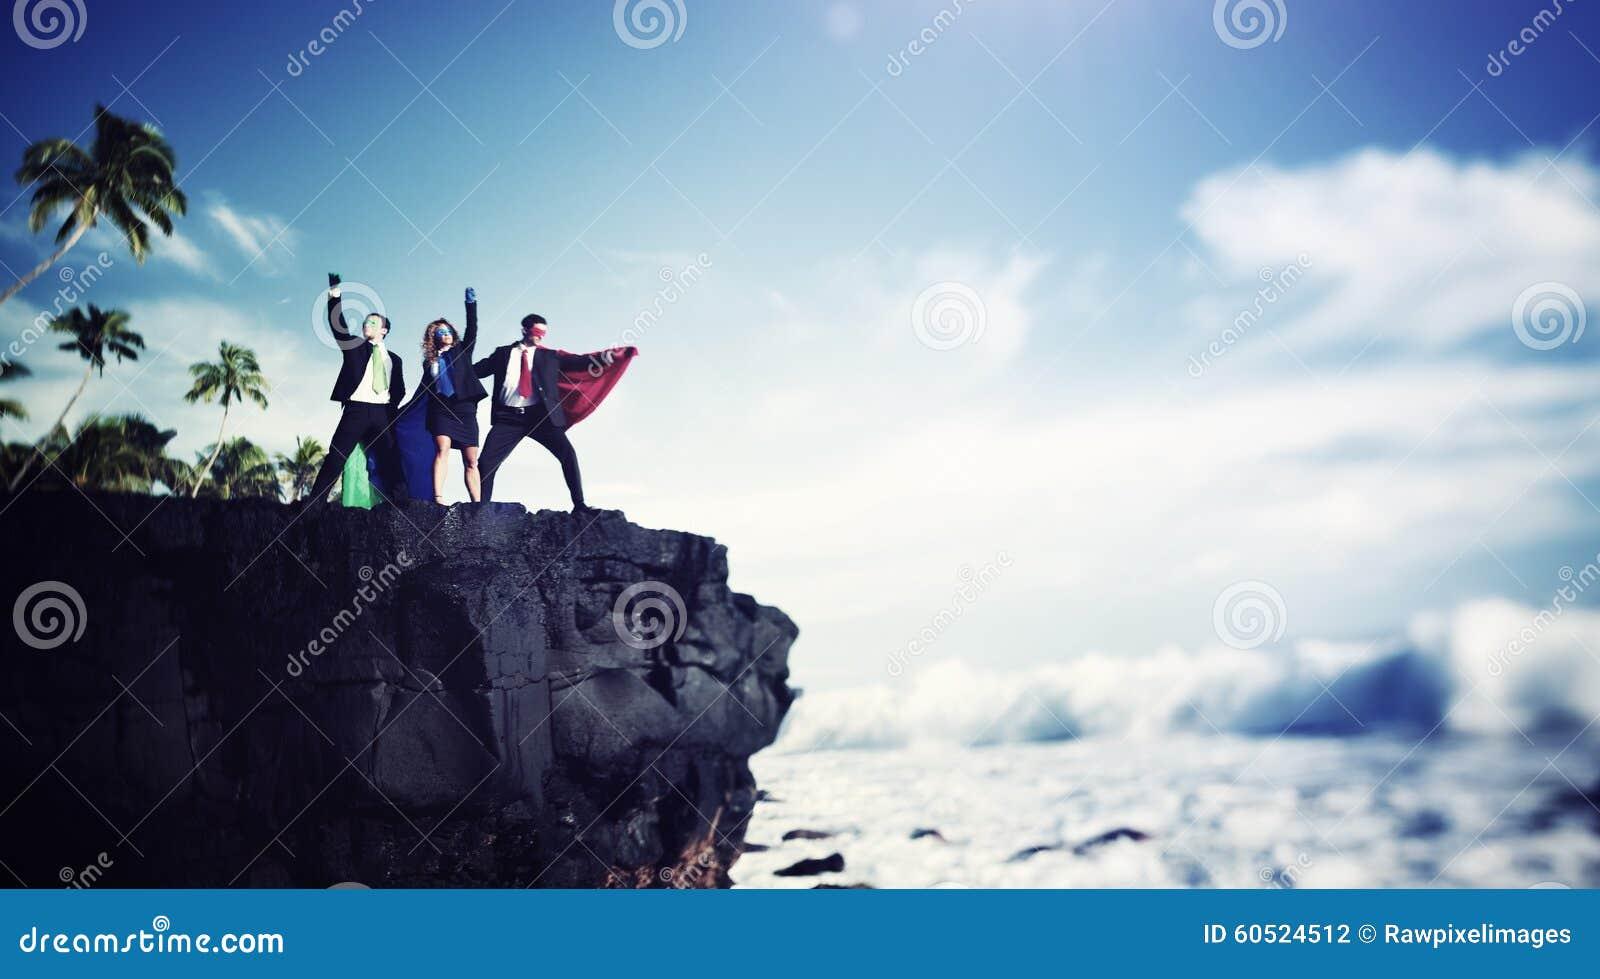 Rand Cliff Achievement Success Concept de bedrijfs van Superheroes